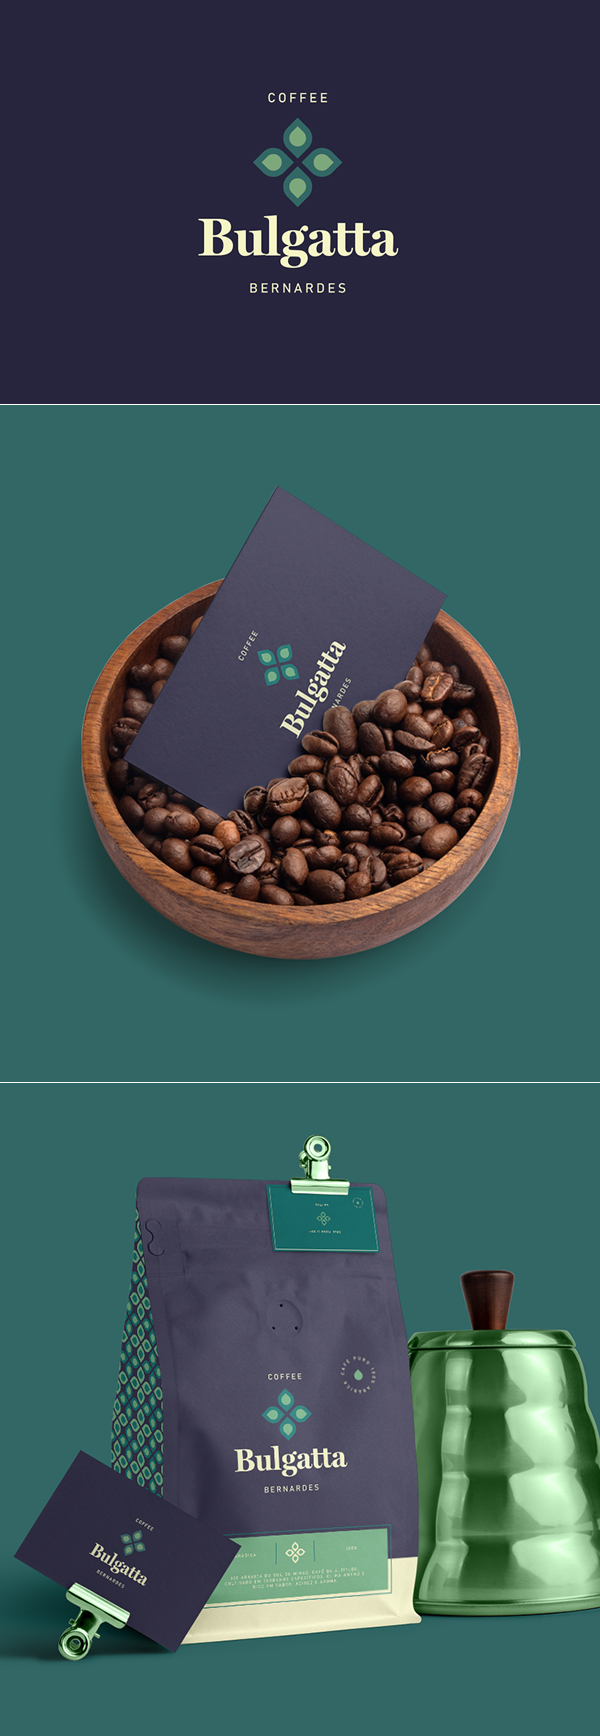 Coffee Bulgatta Bernardes Branding Identity by Matheus Guabiraba